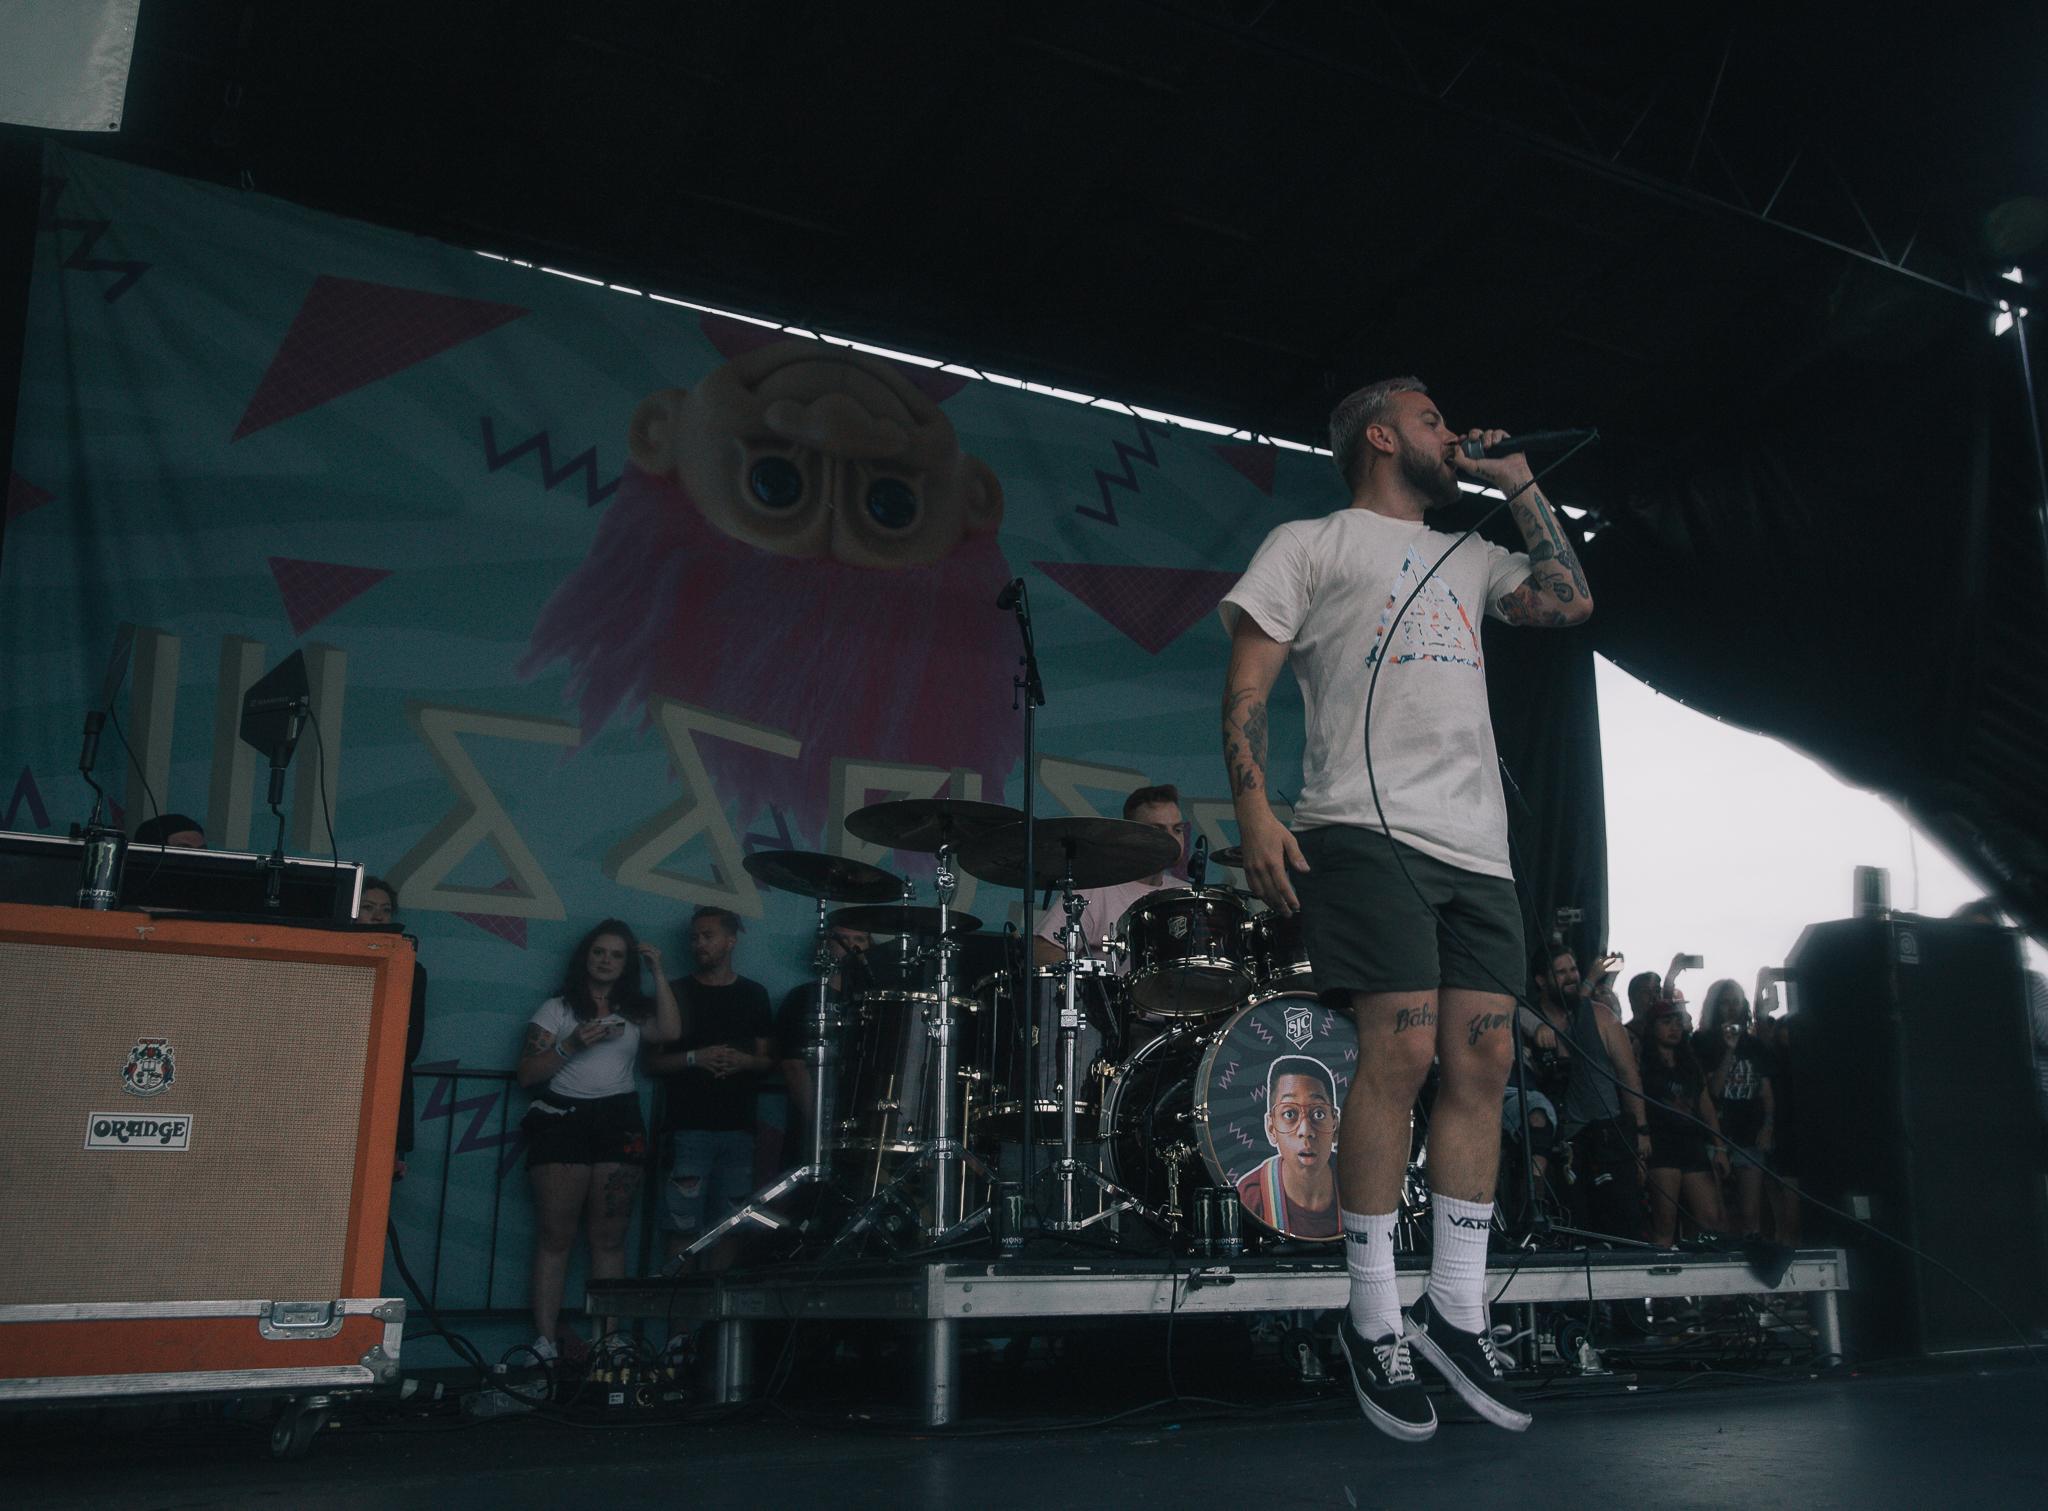 ISSUES PERFORMING AT VAN'S WARPED TOUR IN SAN ANTONIO, TX ON JULY 07, 2018.